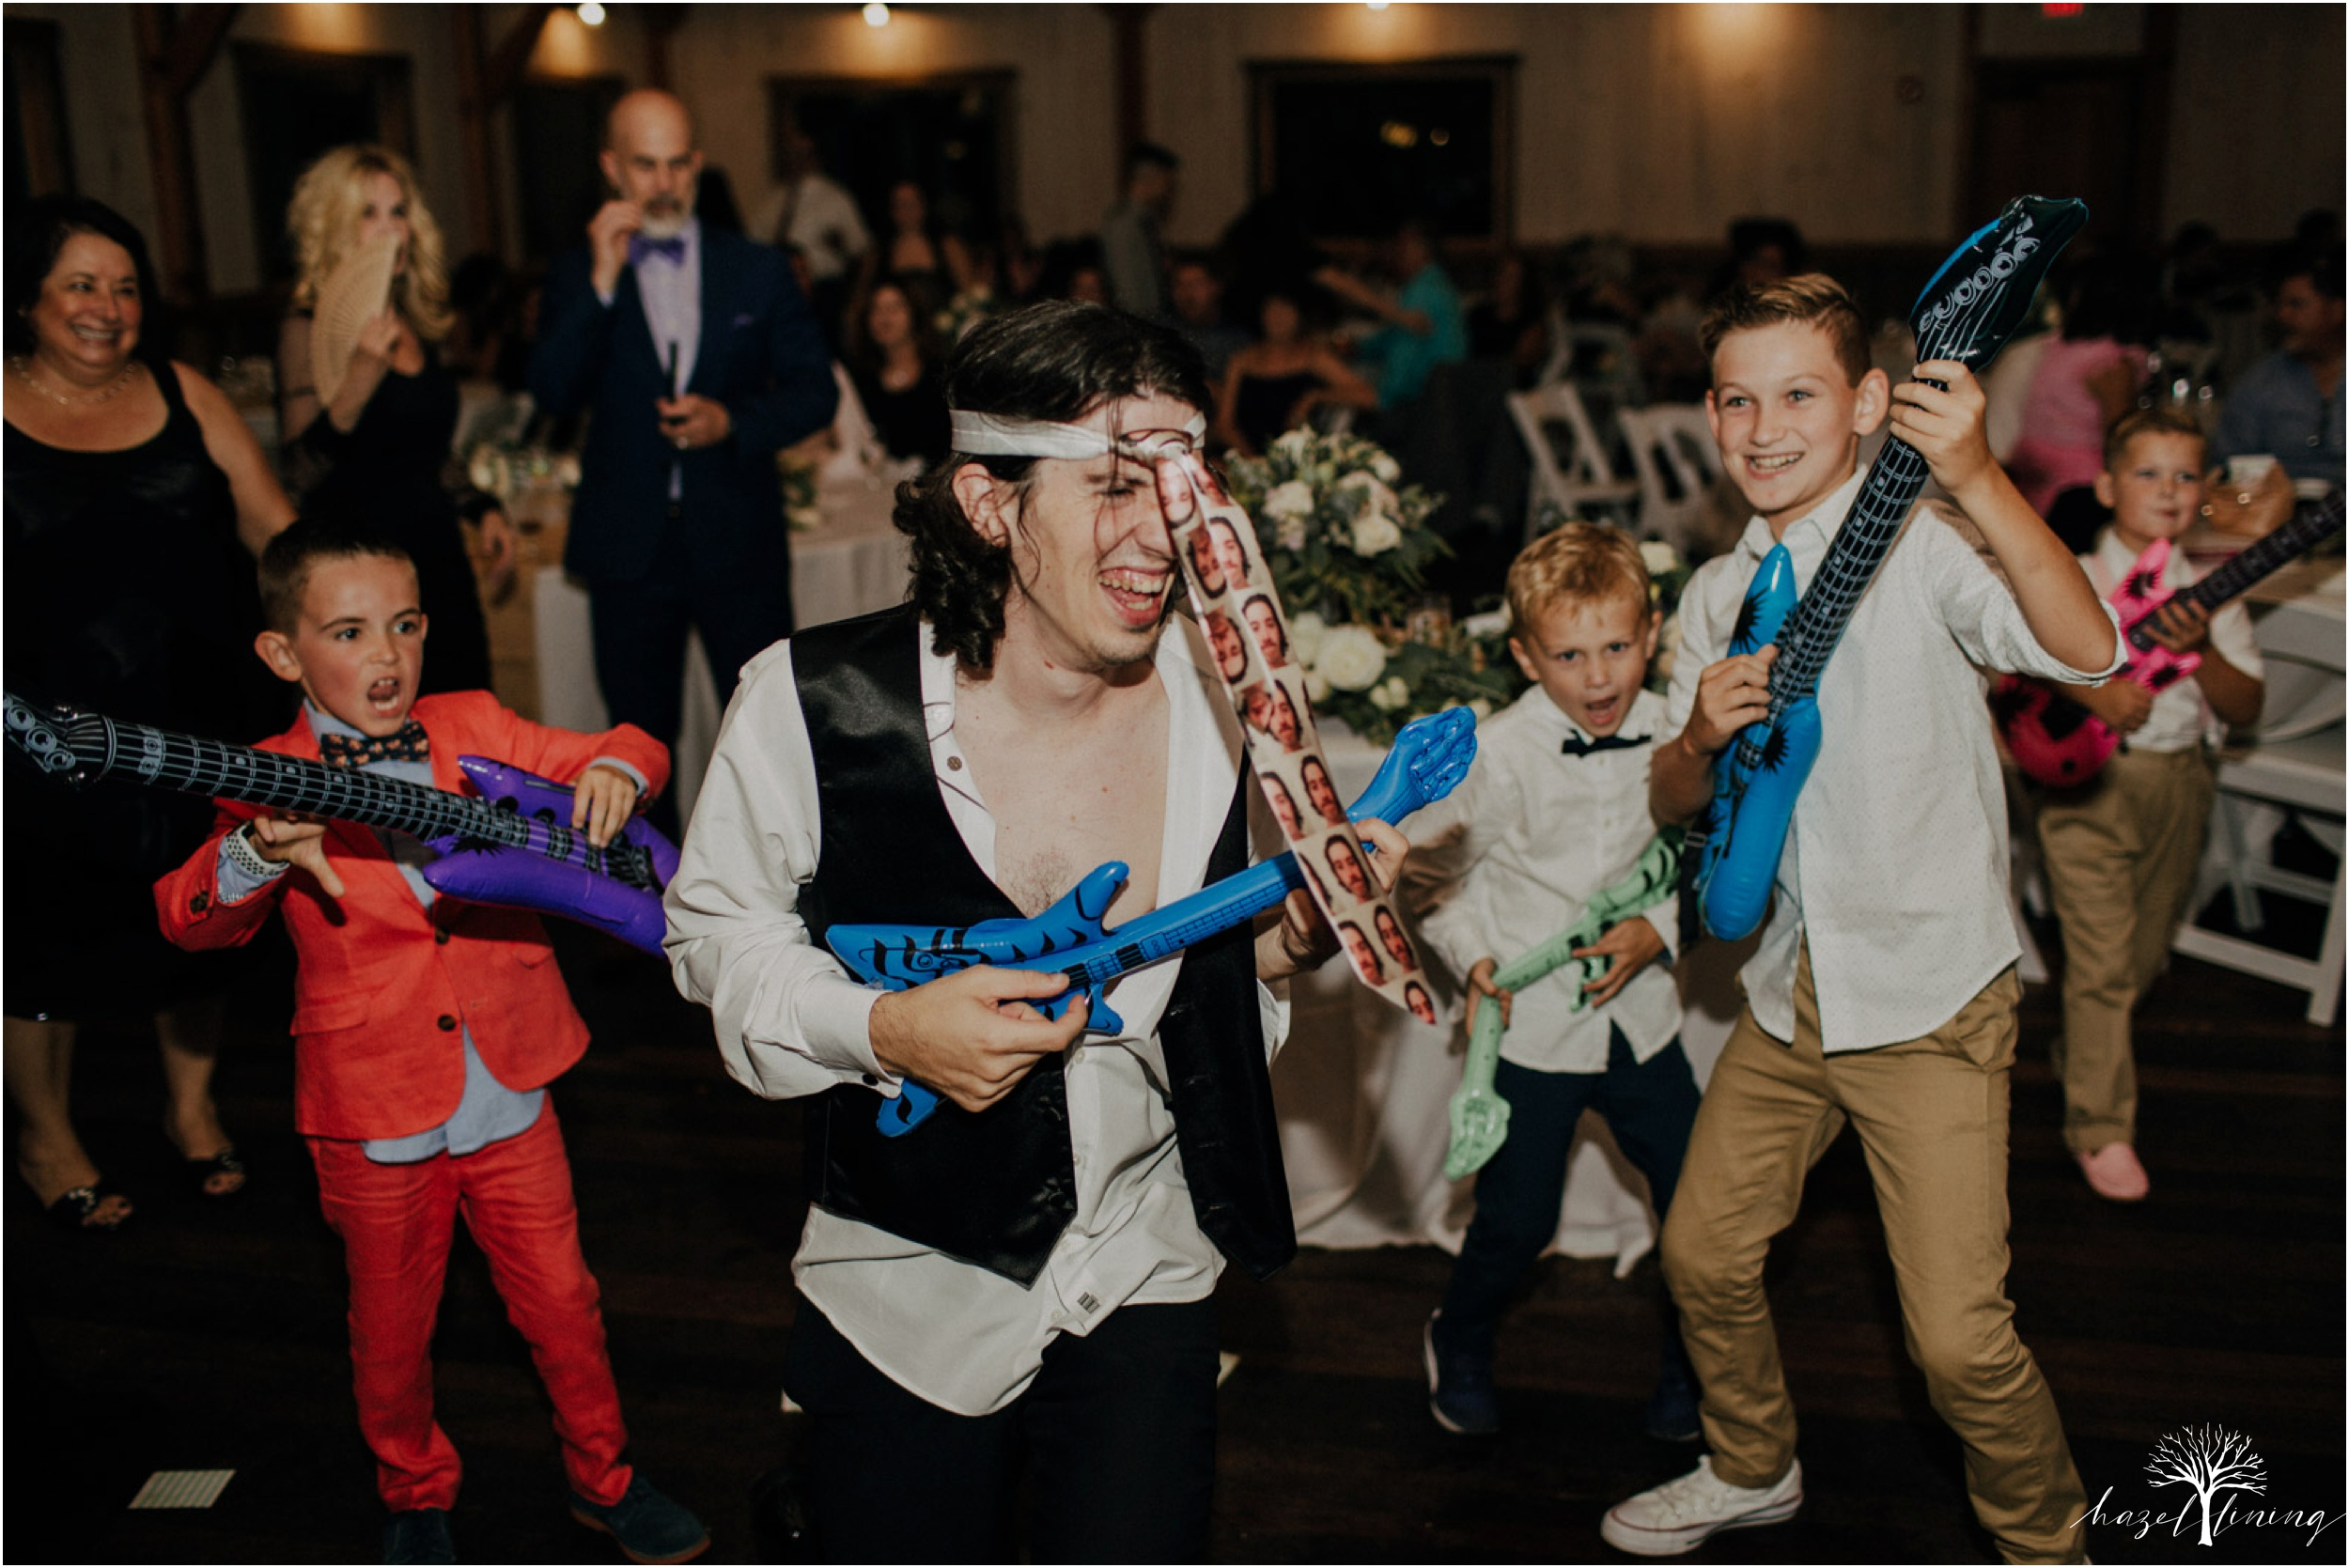 maureen-hepner-anthony-giordano-rose-bank-winery-newtow-pennsylvania-luxury-summer-wedding-hazel-lining-photography-destination-elopement-wedding-engagement-photography_0161.jpg